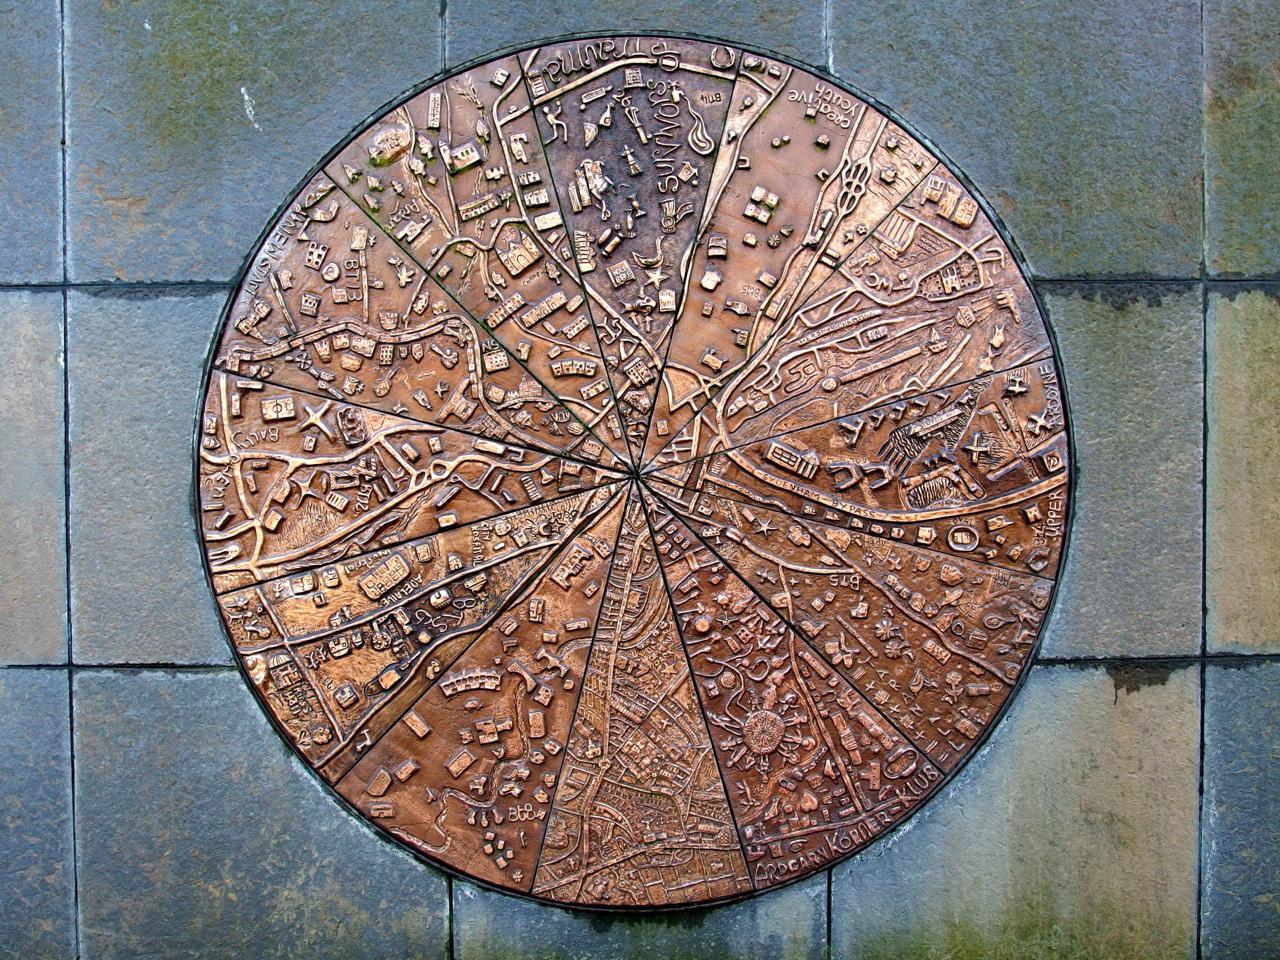 20160206 Four Corners - 11 Wheel